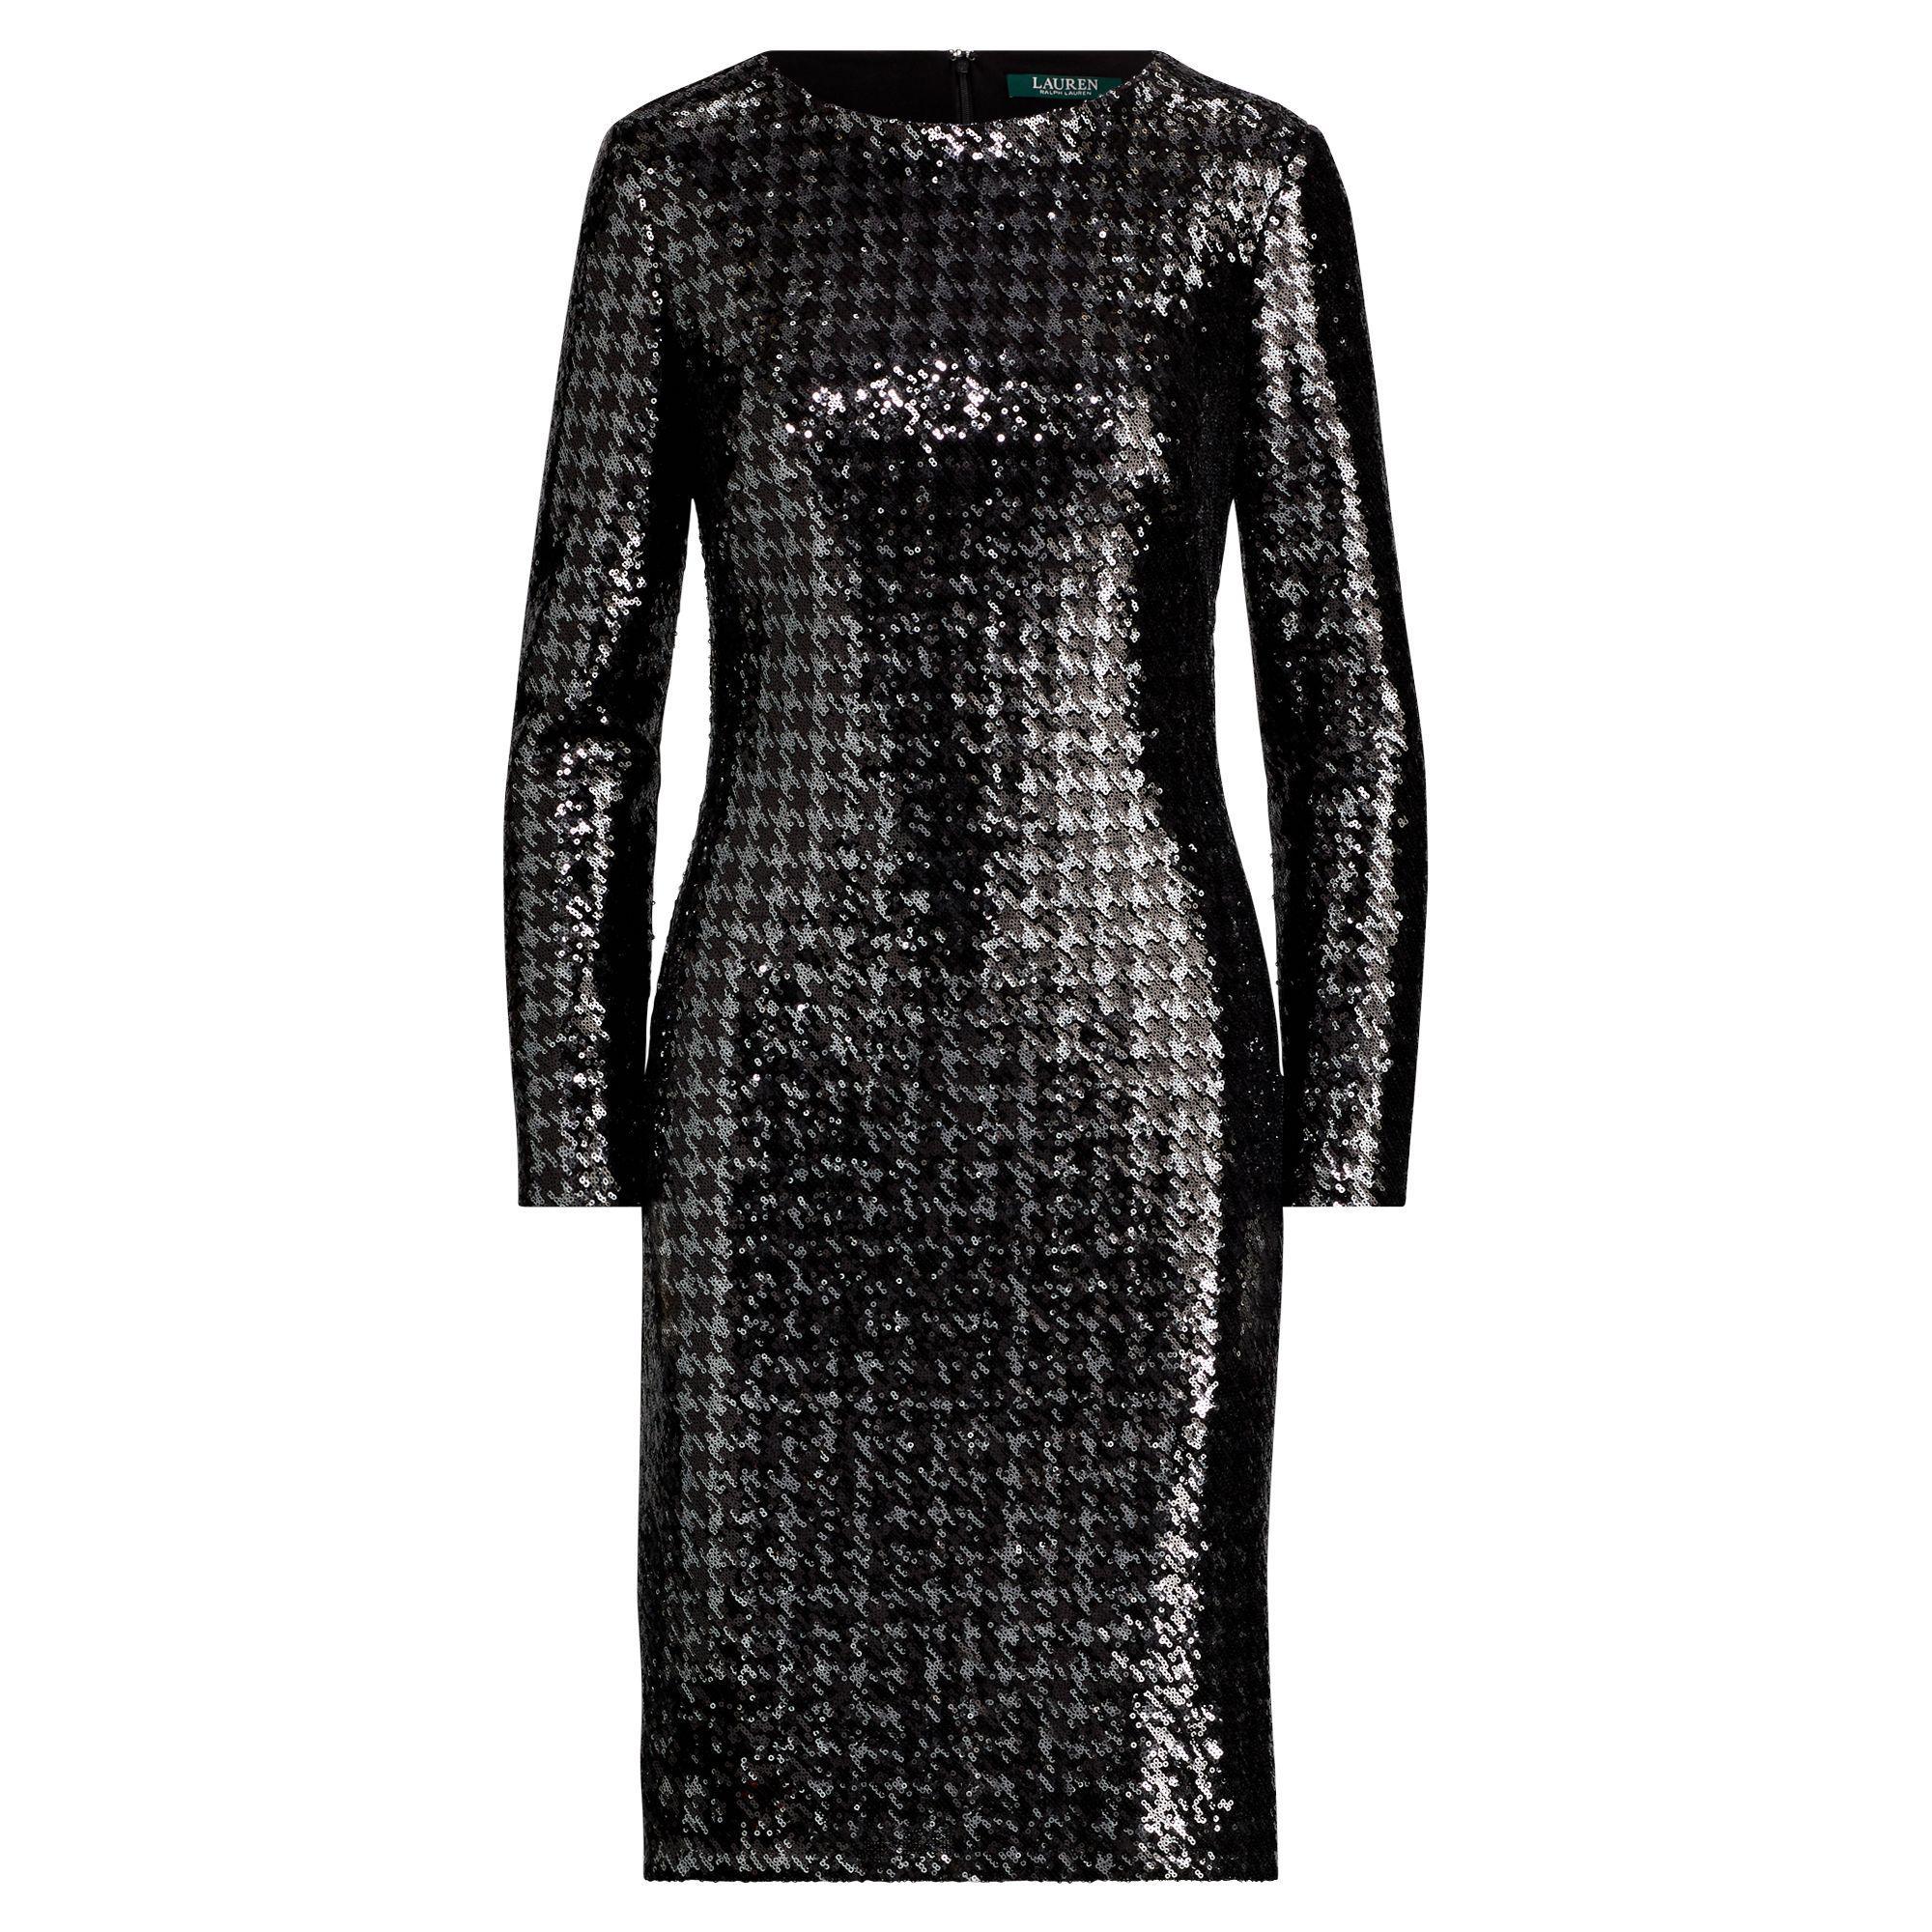 7014bc2b62c52d Lyst - Ralph Lauren Sequined Houndstooth Dress in Black